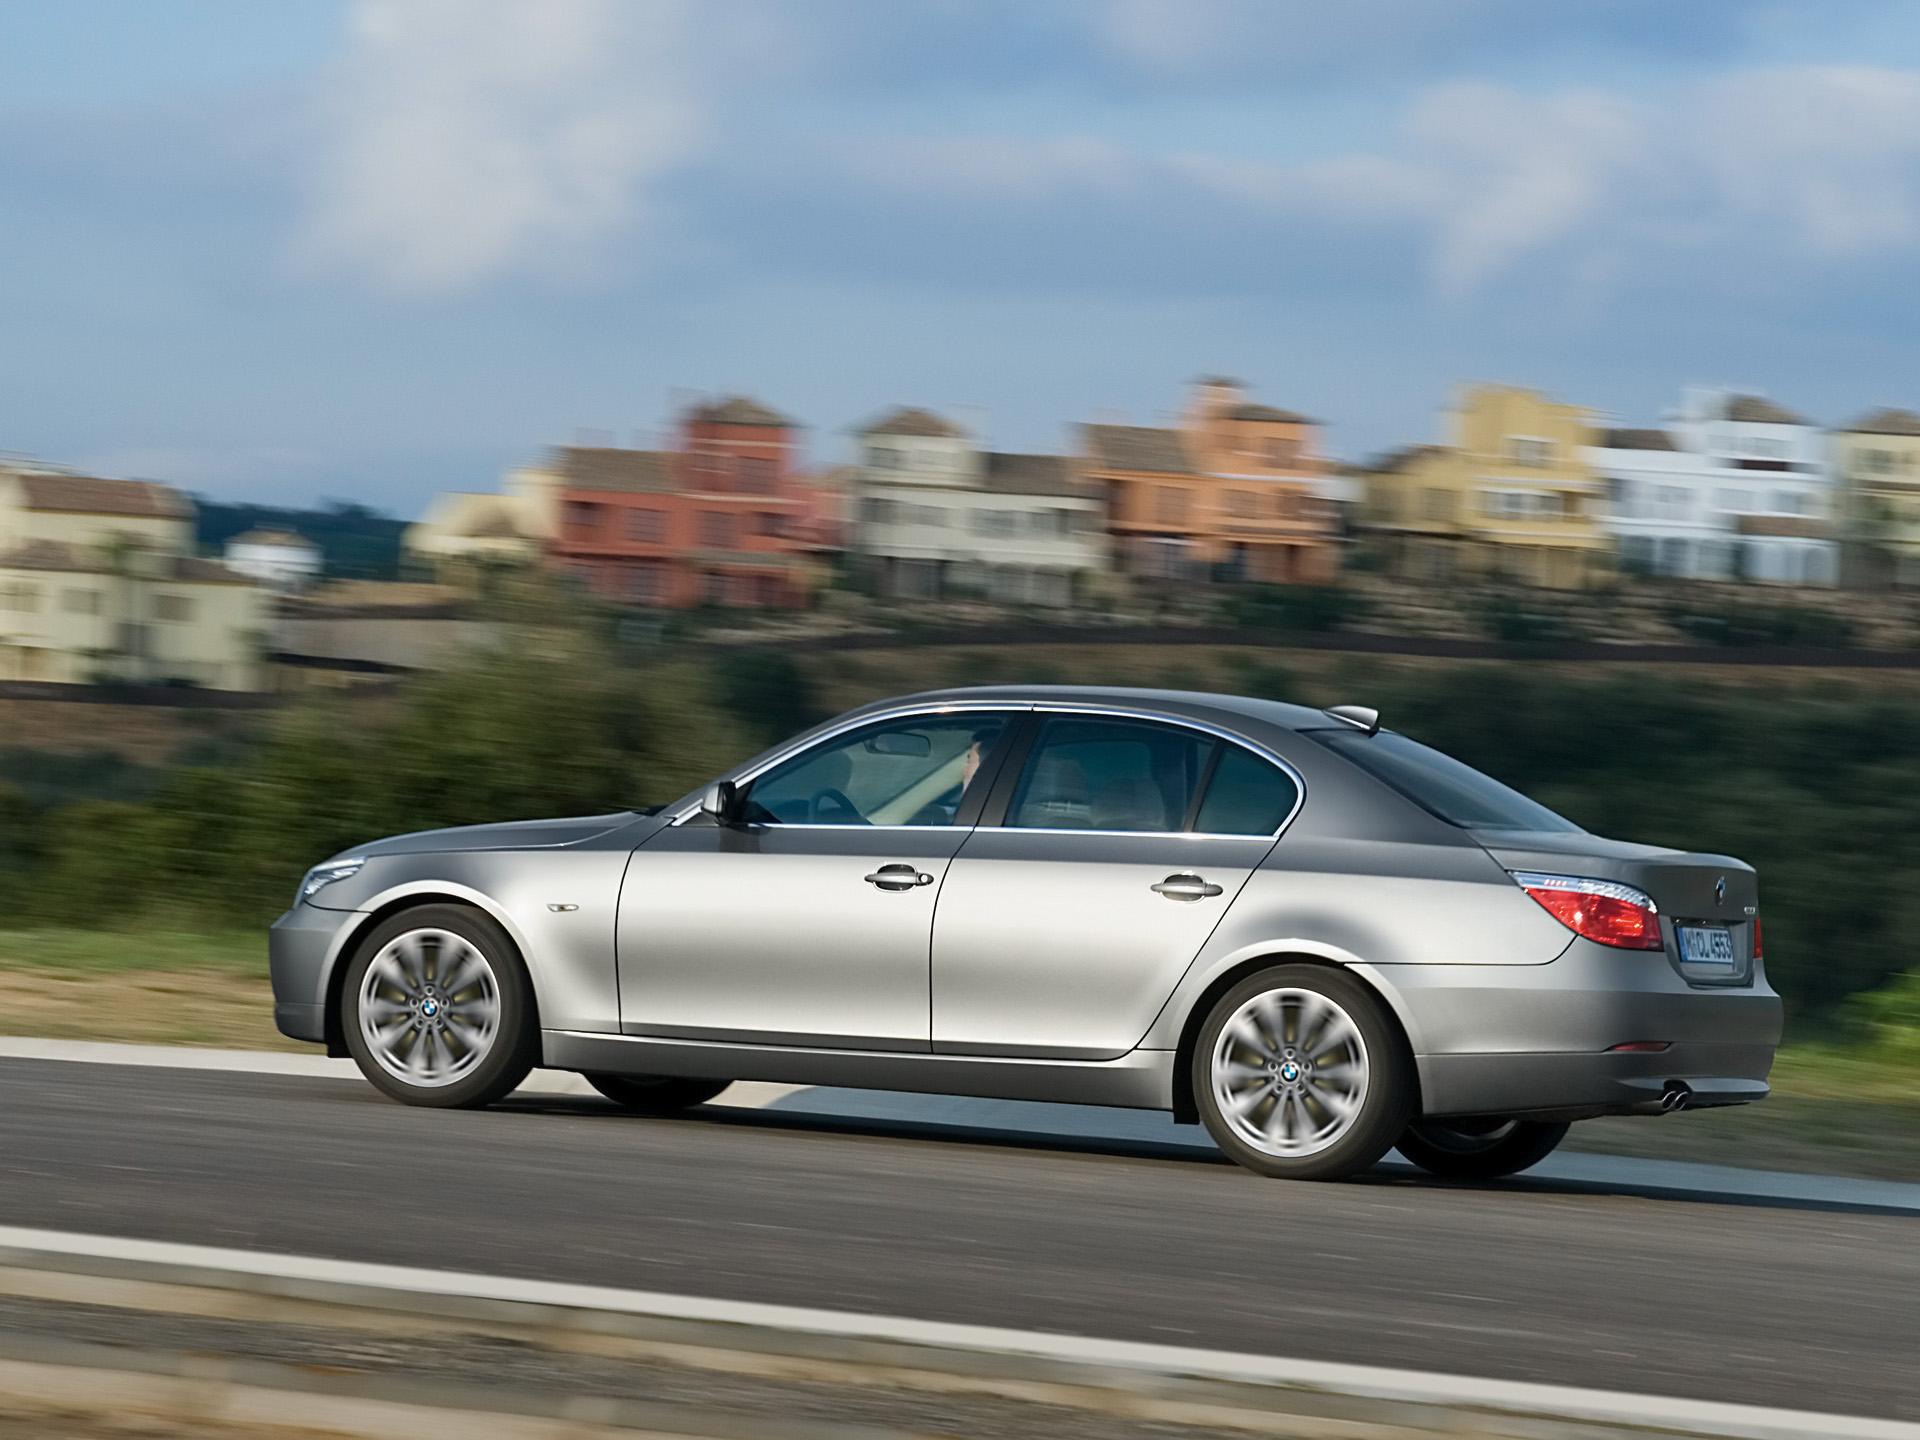 2008 BMW 5er #227373 - Best quality free high resolution ...